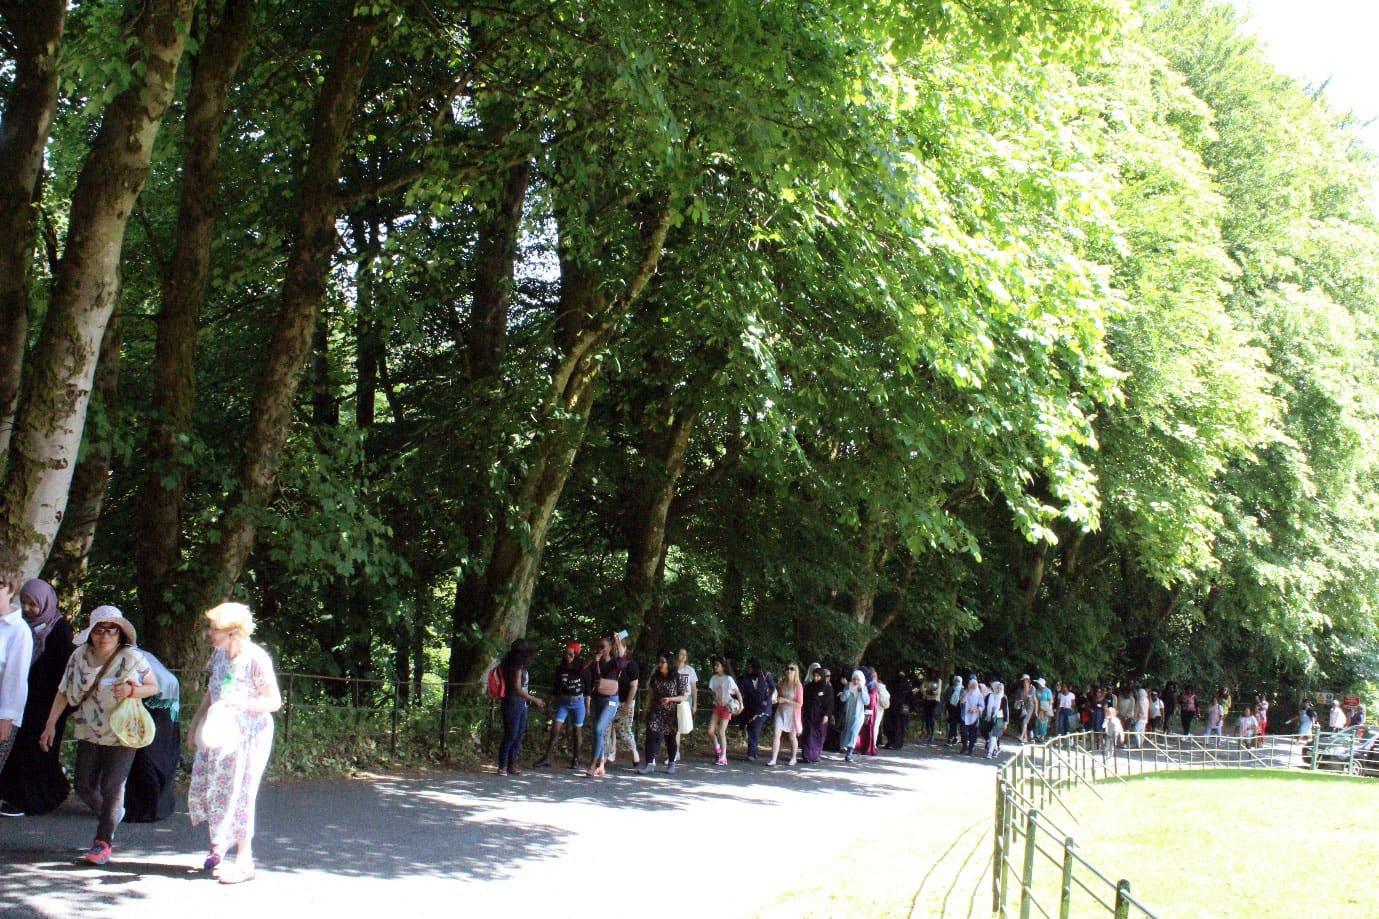 Walk & Create With Us - where community, art, nature & interculturalism meet